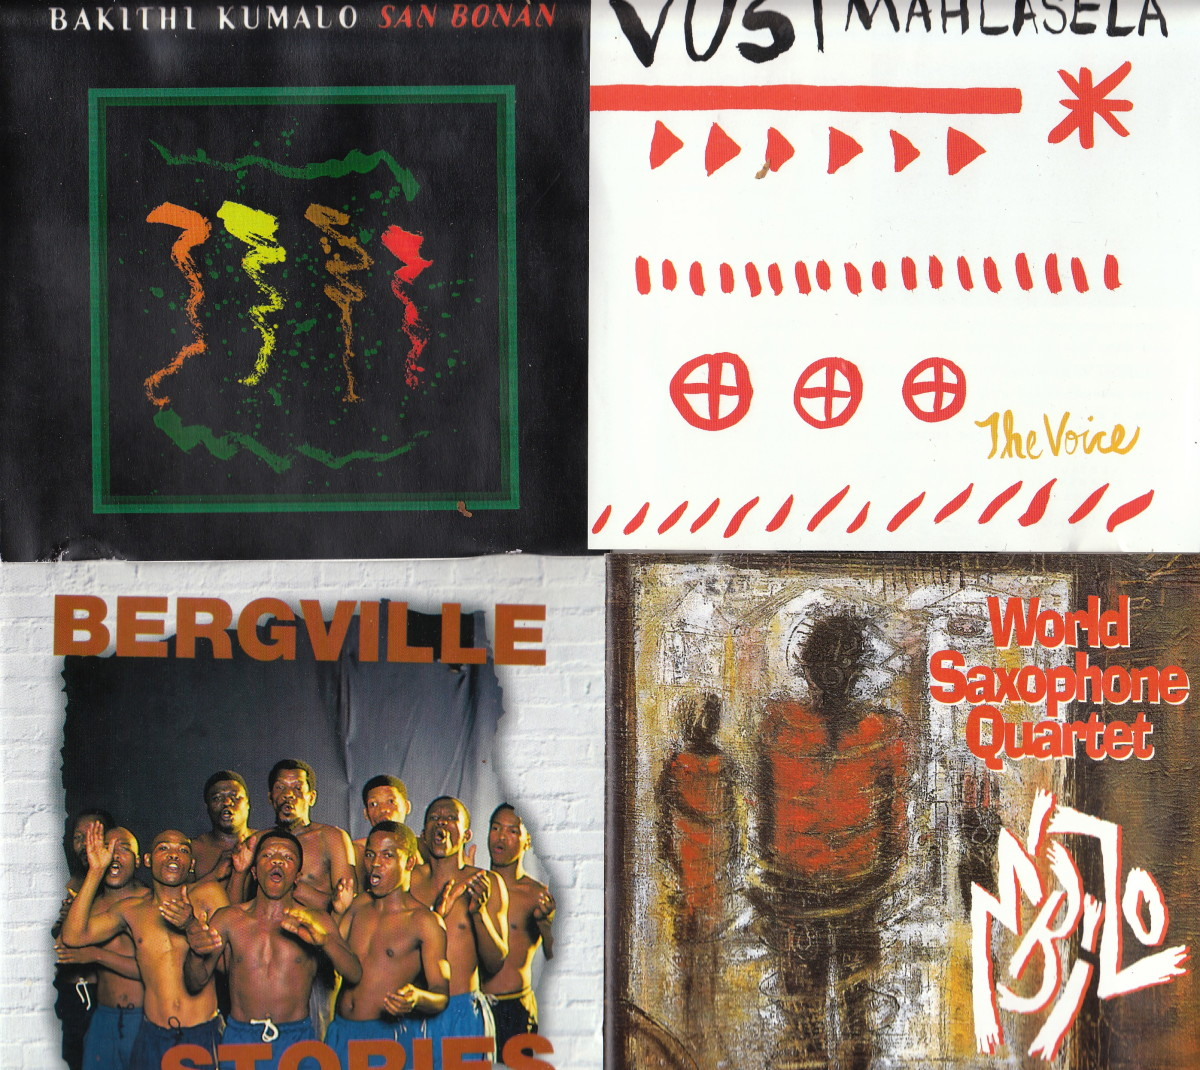 Bakithi Kjumalo; Vusi Mahlasela; Bergville Stories; Imbizo